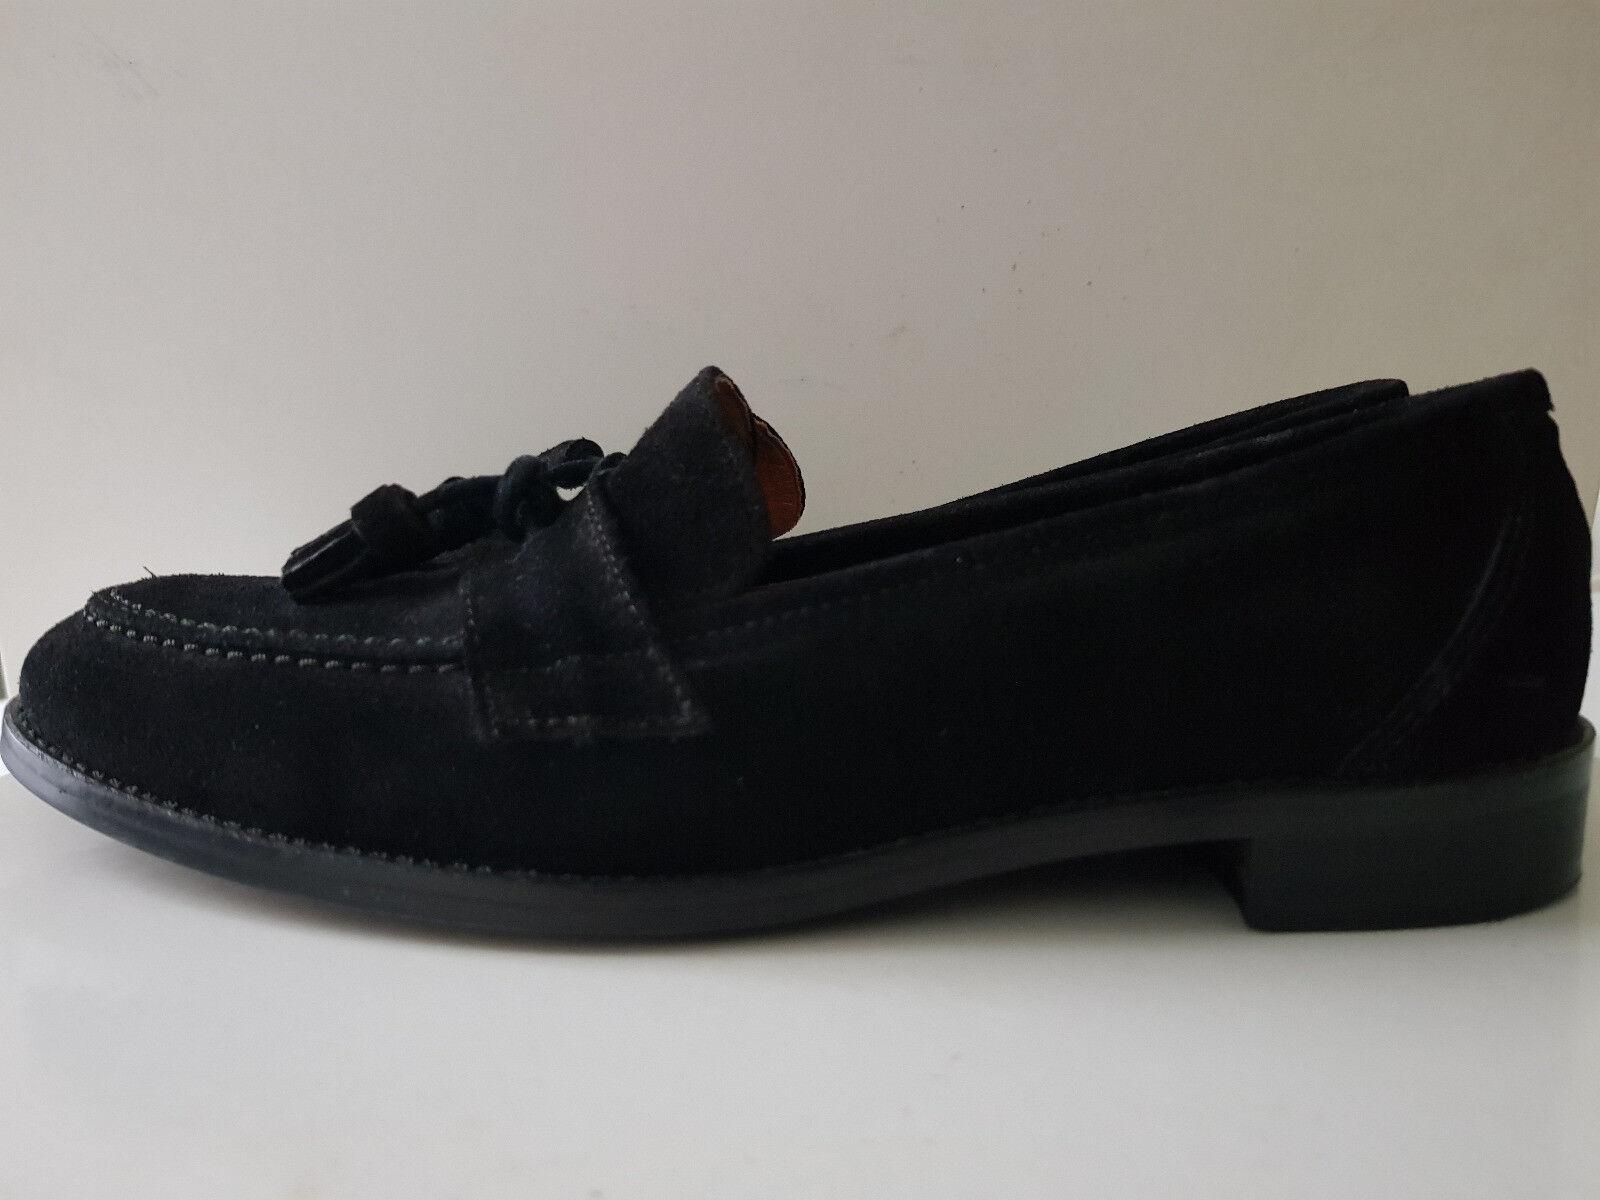 Rudys - has black moccasins tassels-size 39-free postage france